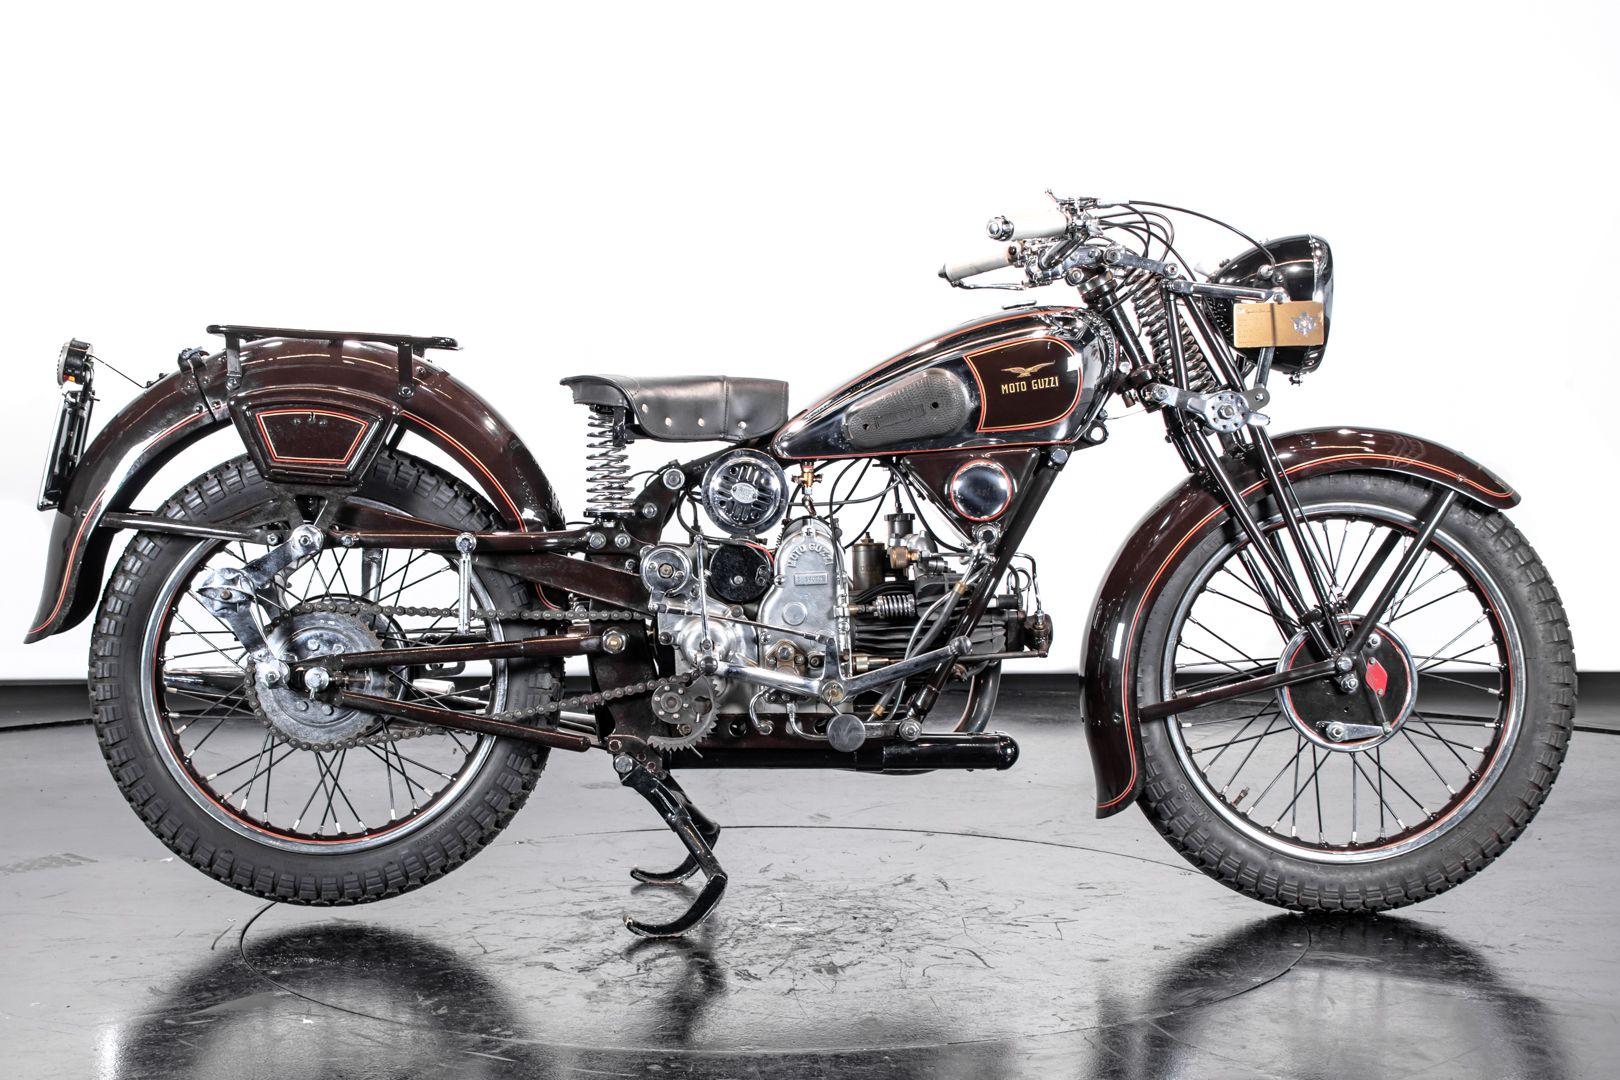 1951 Moto Guzzi 500 72168